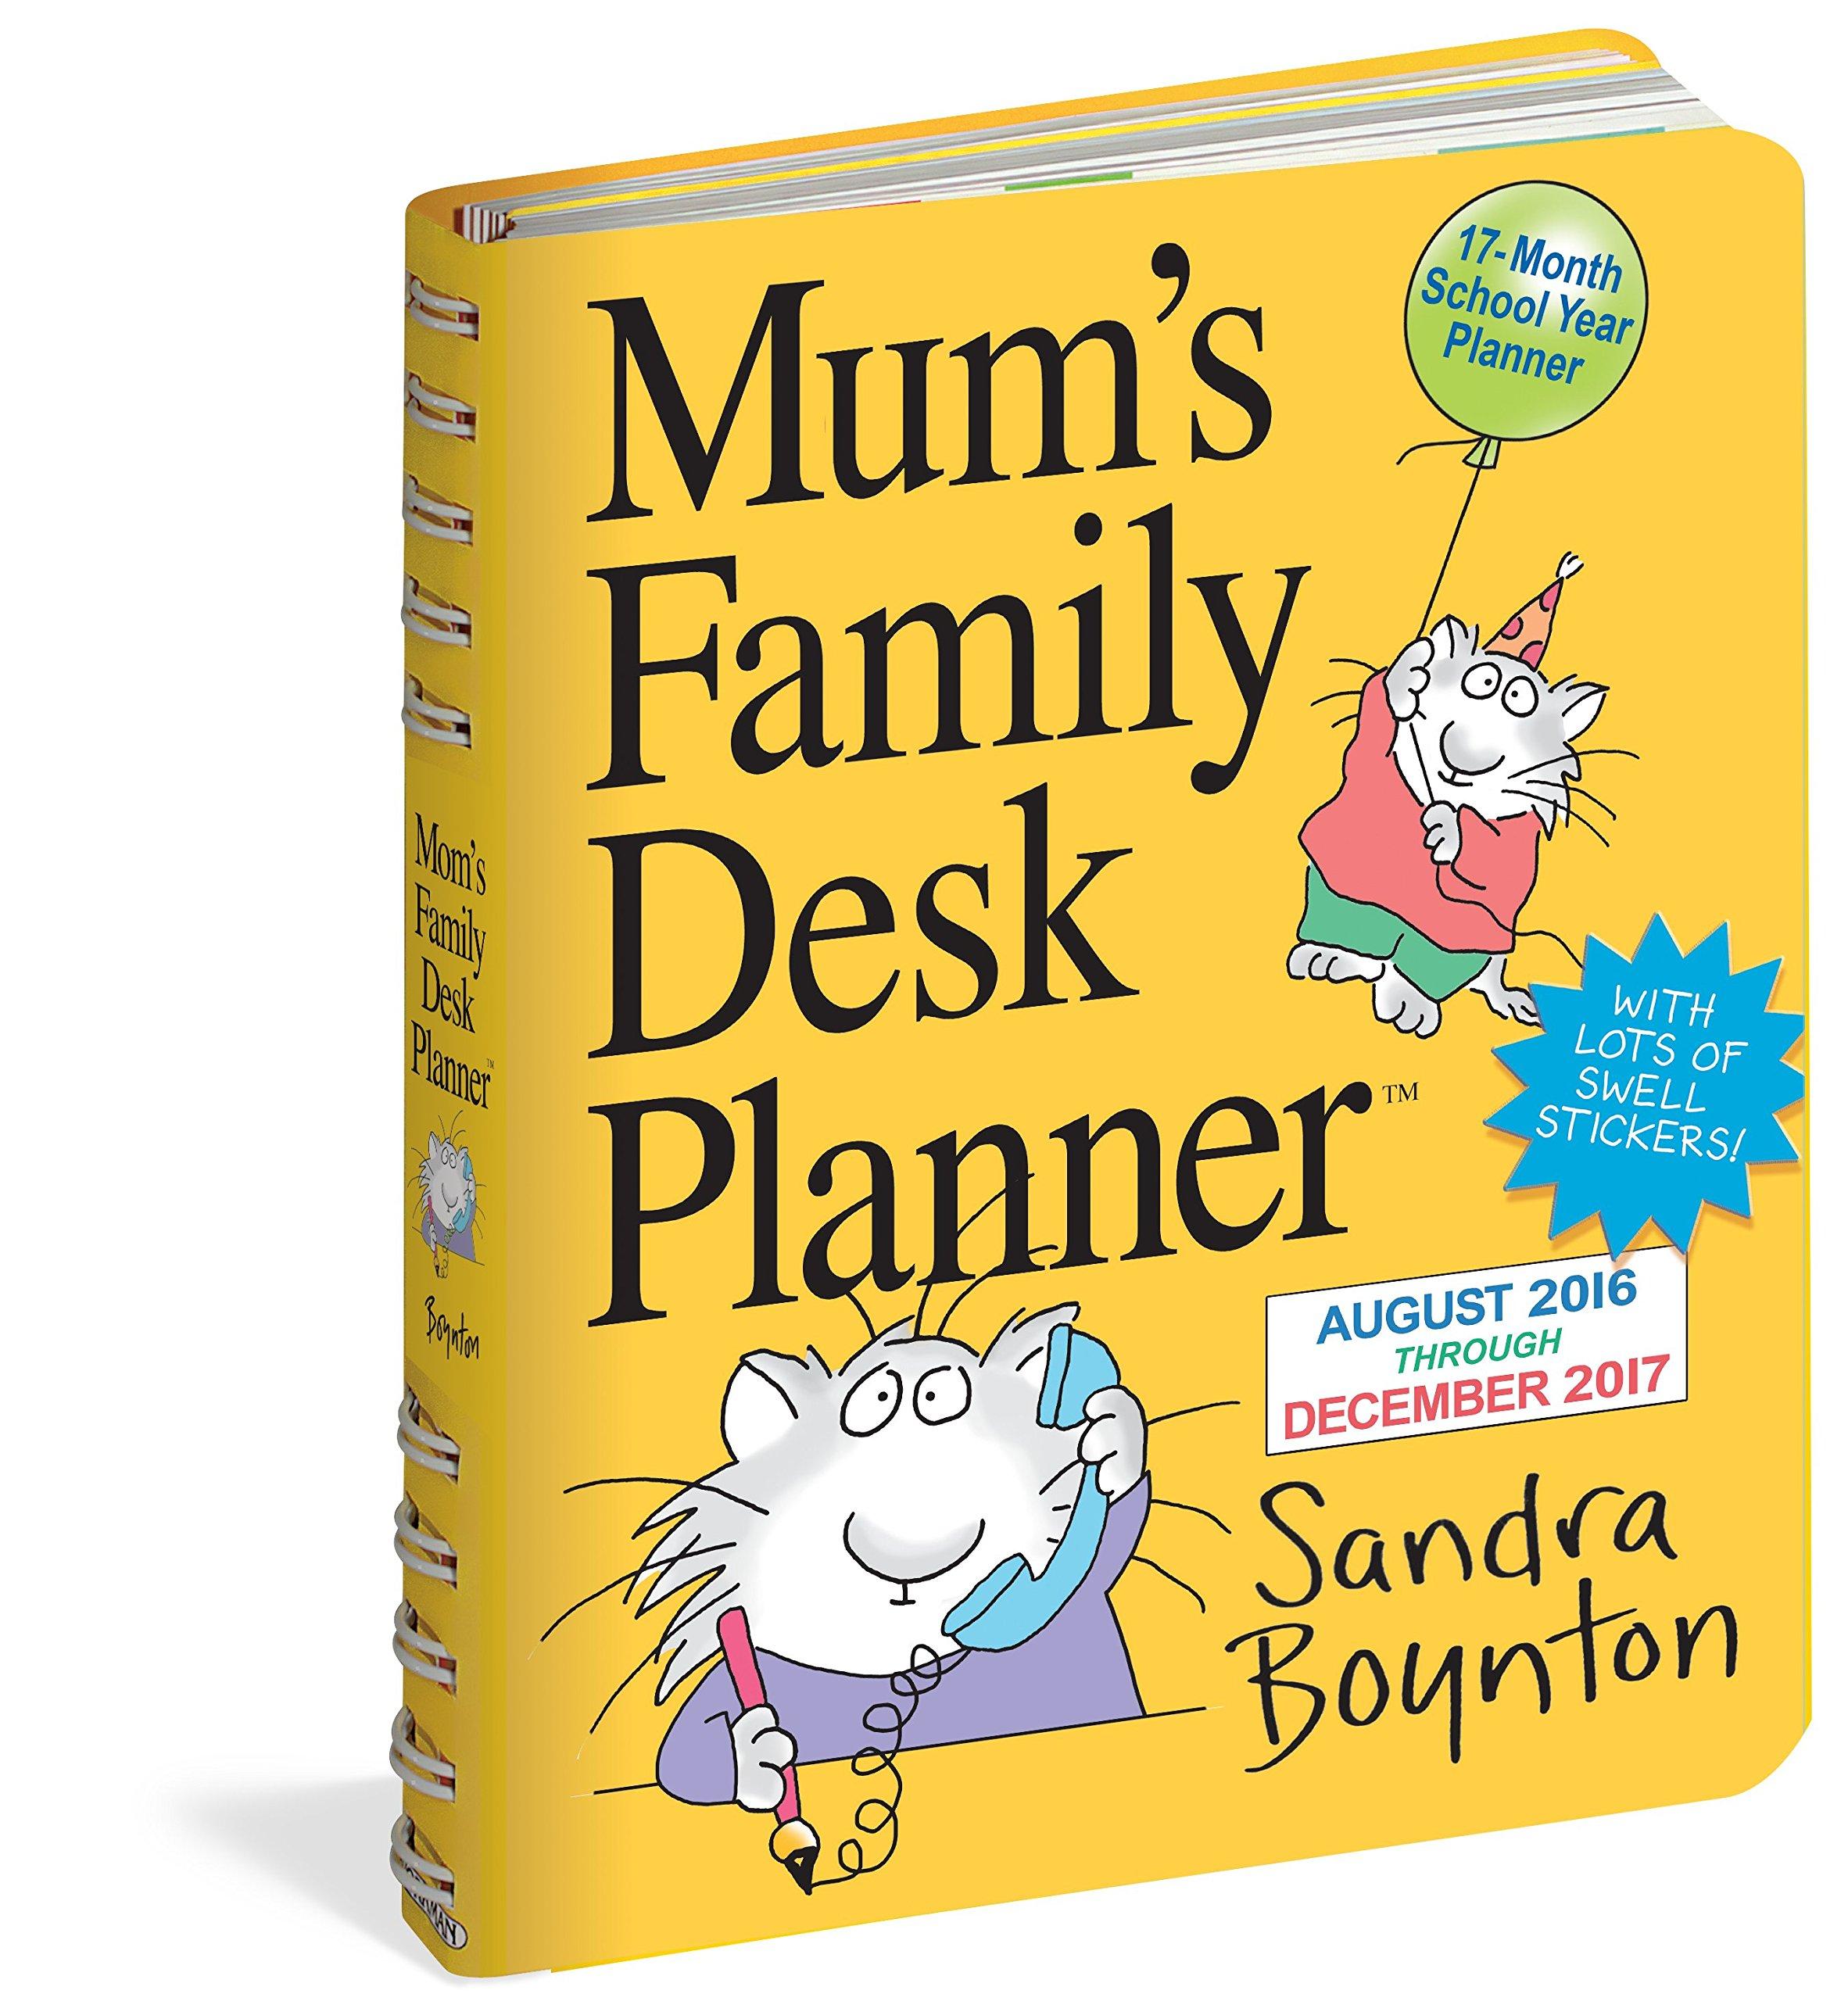 mum s family planner desk diary amazon co uk sandra boynton books